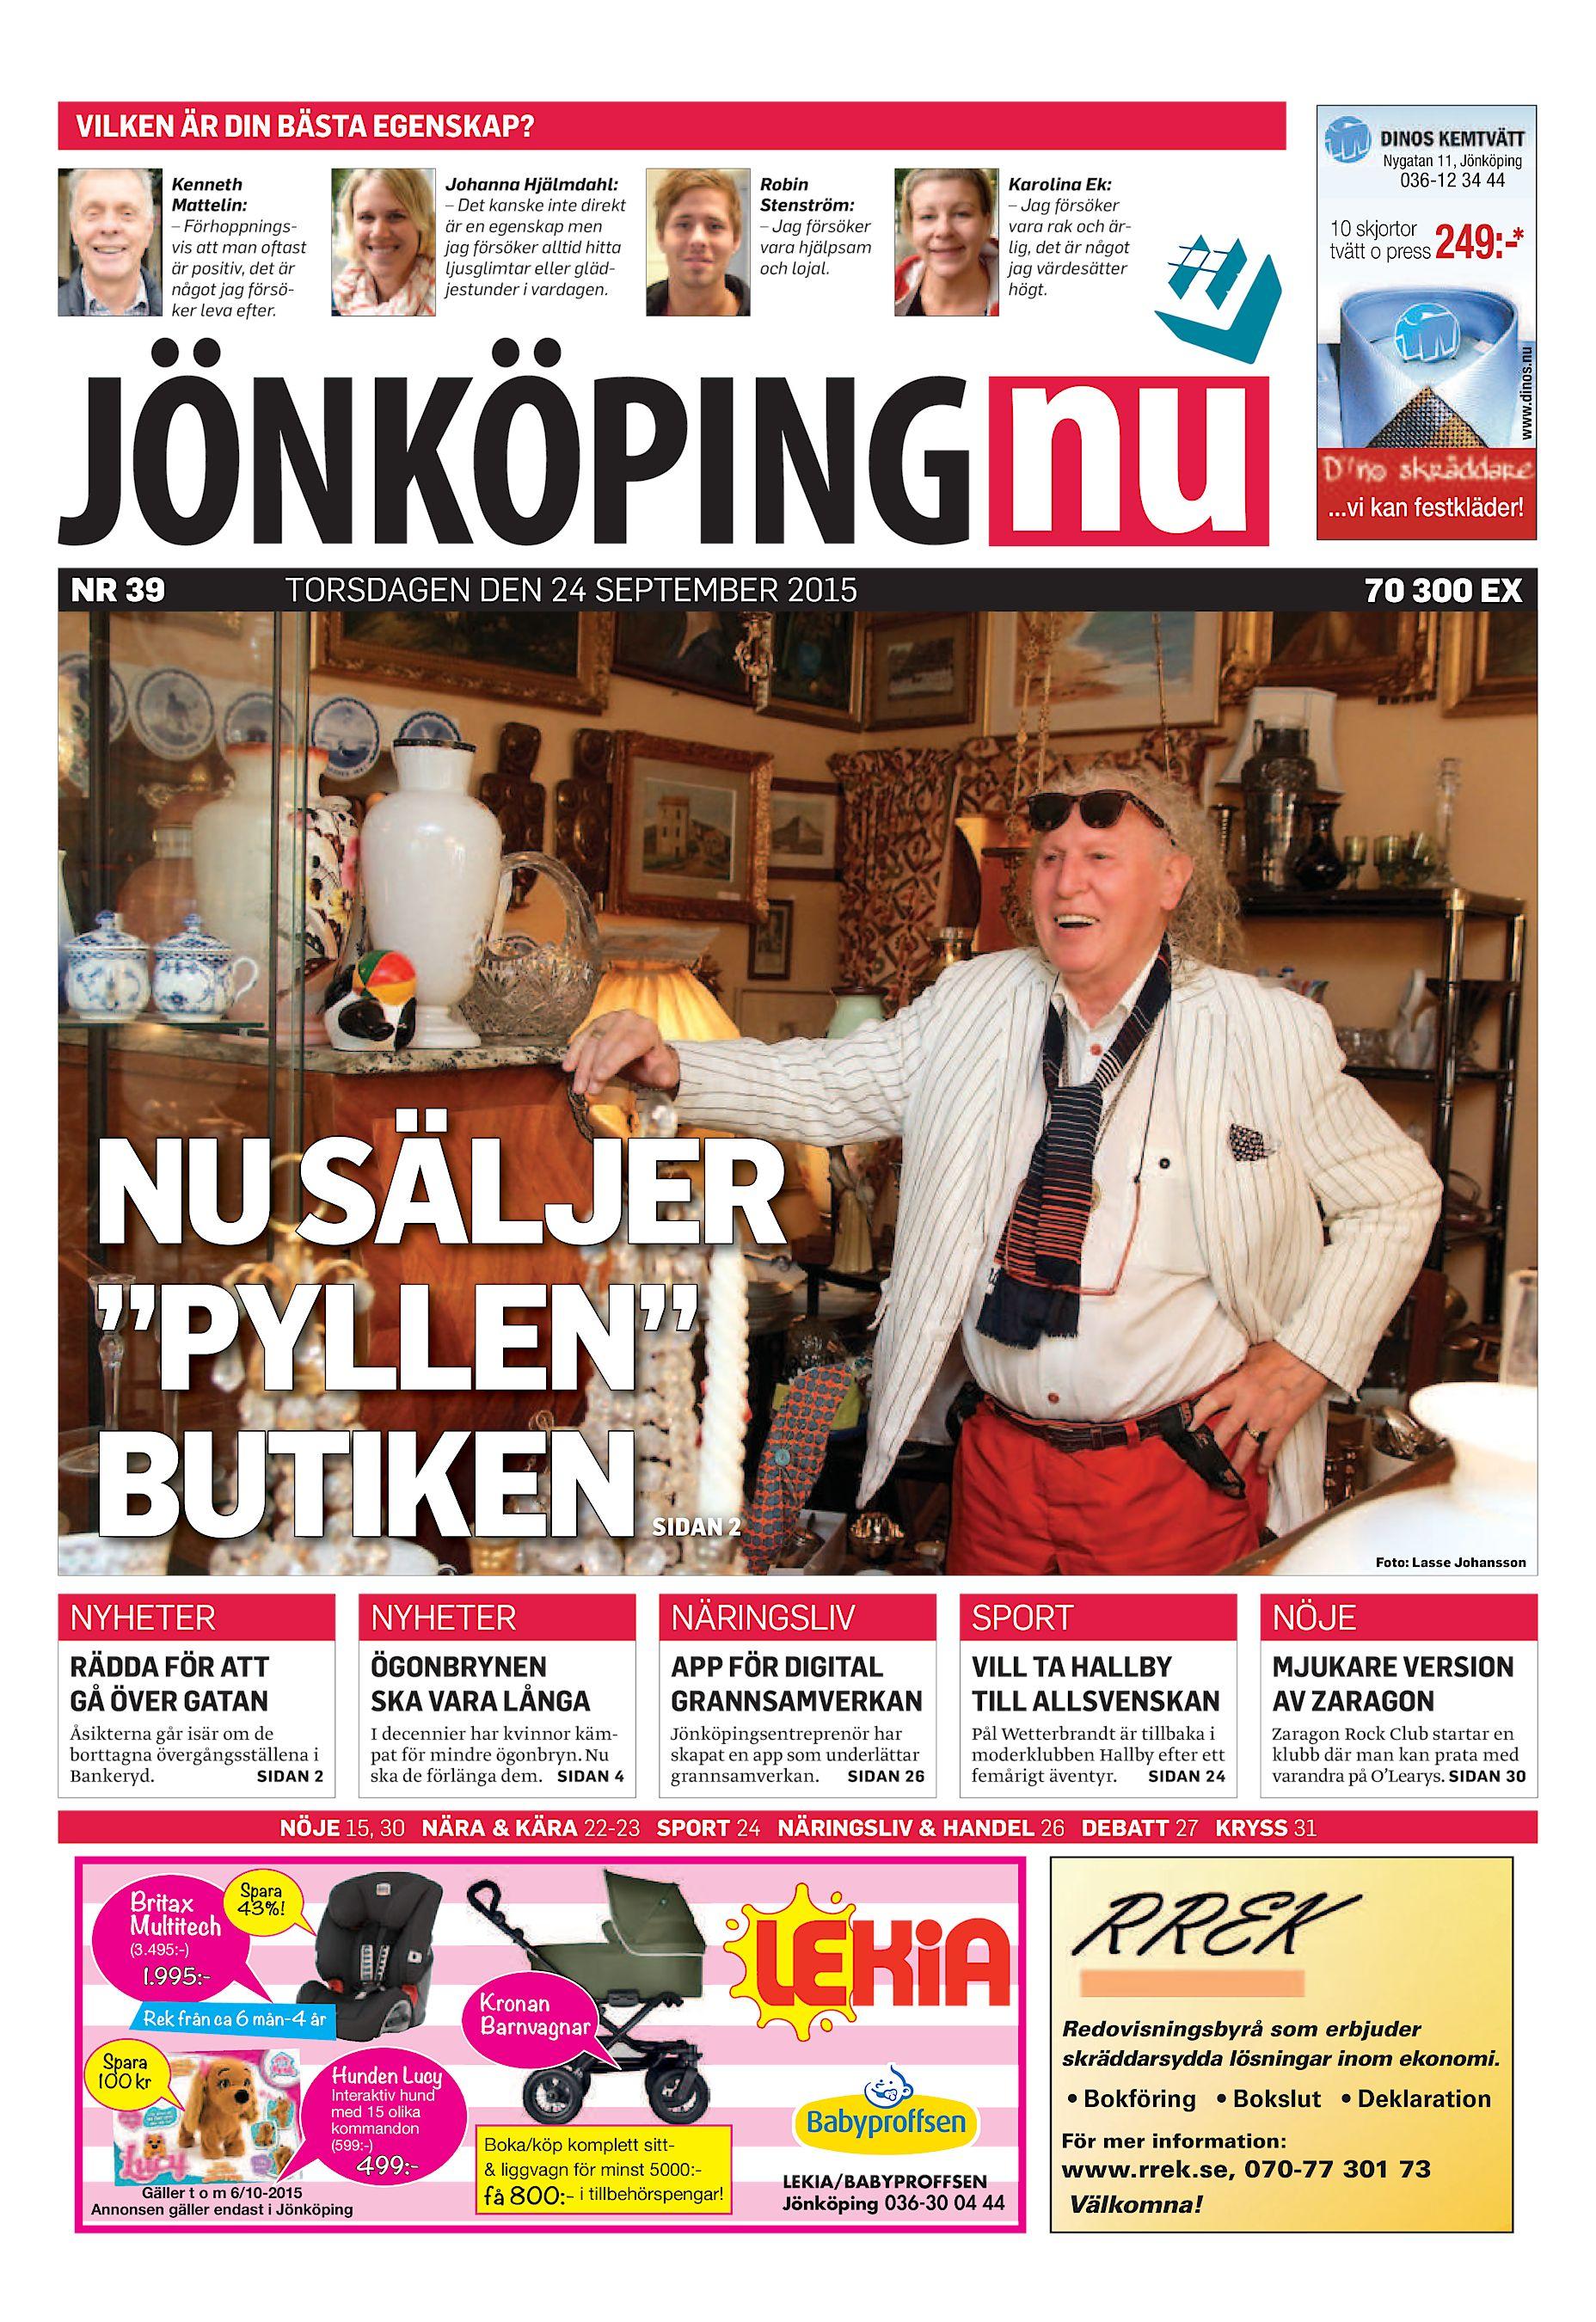 6e0041e733eb Jönköping.nu JNU-20150924 (endast text)